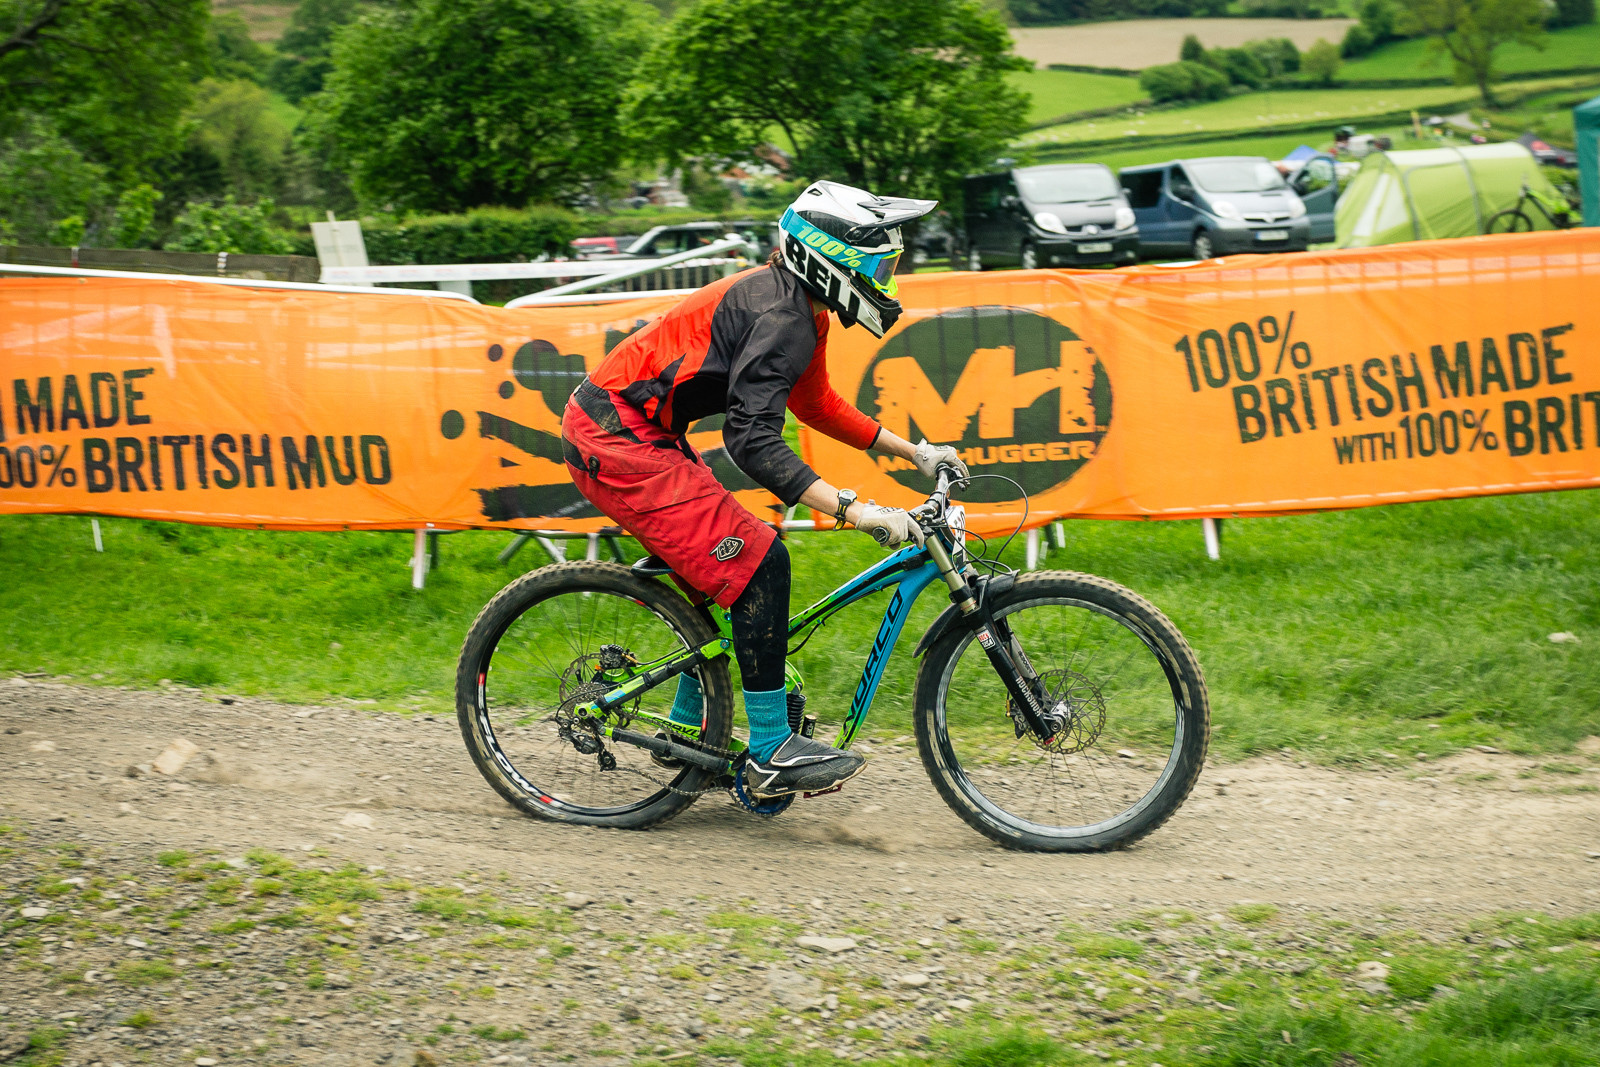 Norco Aurum G-ed Out at Llangollen - G-Out Project - Llangollen BDS 2015 - Mountain Biking Pictures - Vital MTB